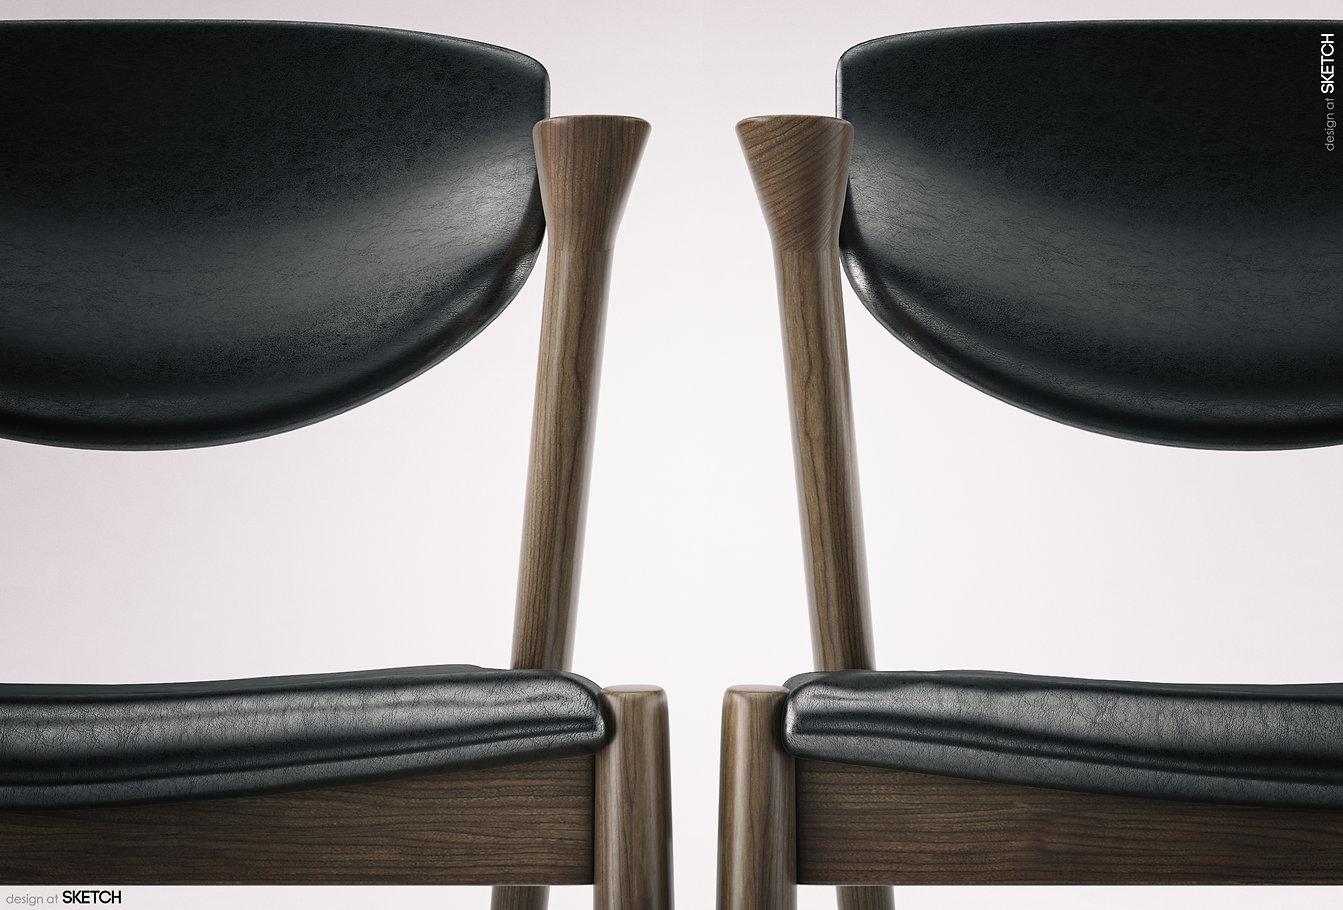 Design_At_Sketch_Chair_02.jpg